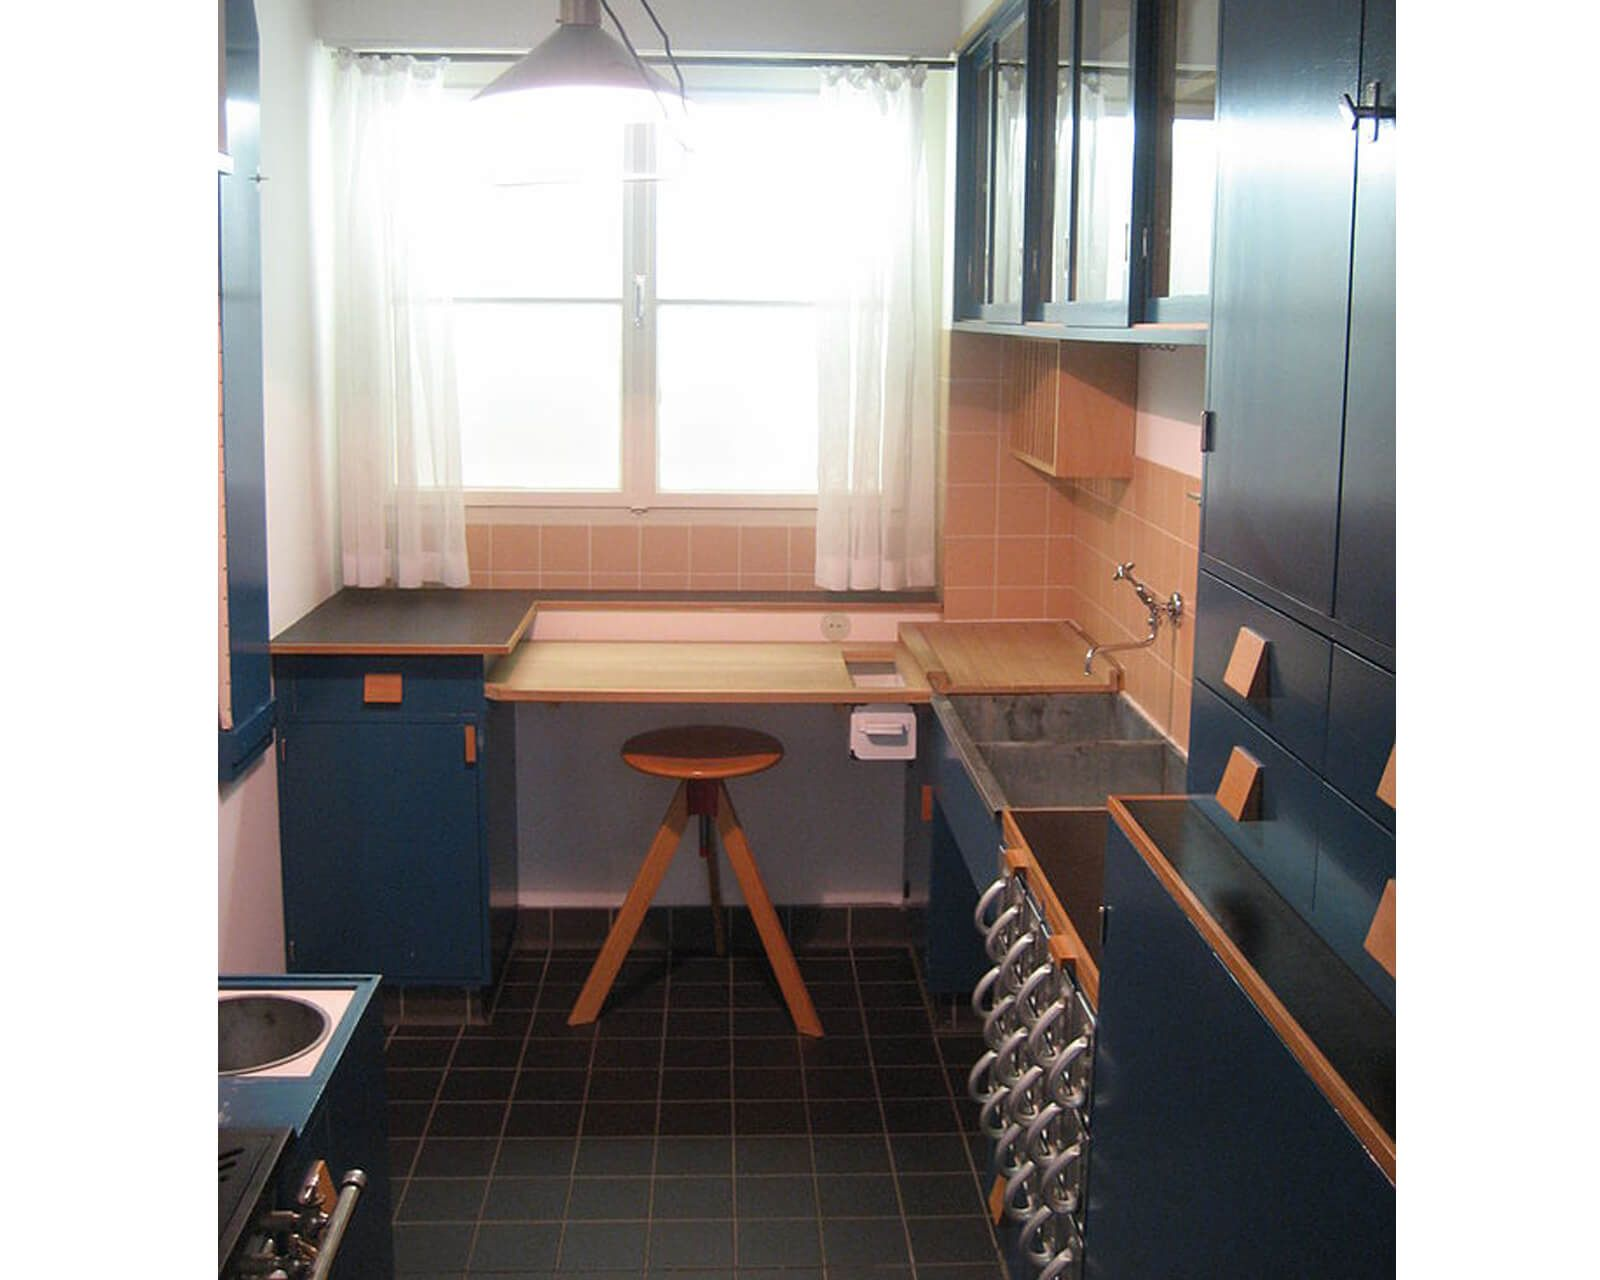 brooklyn kitchen history modern american frankfurt kitchen rh pinterest com